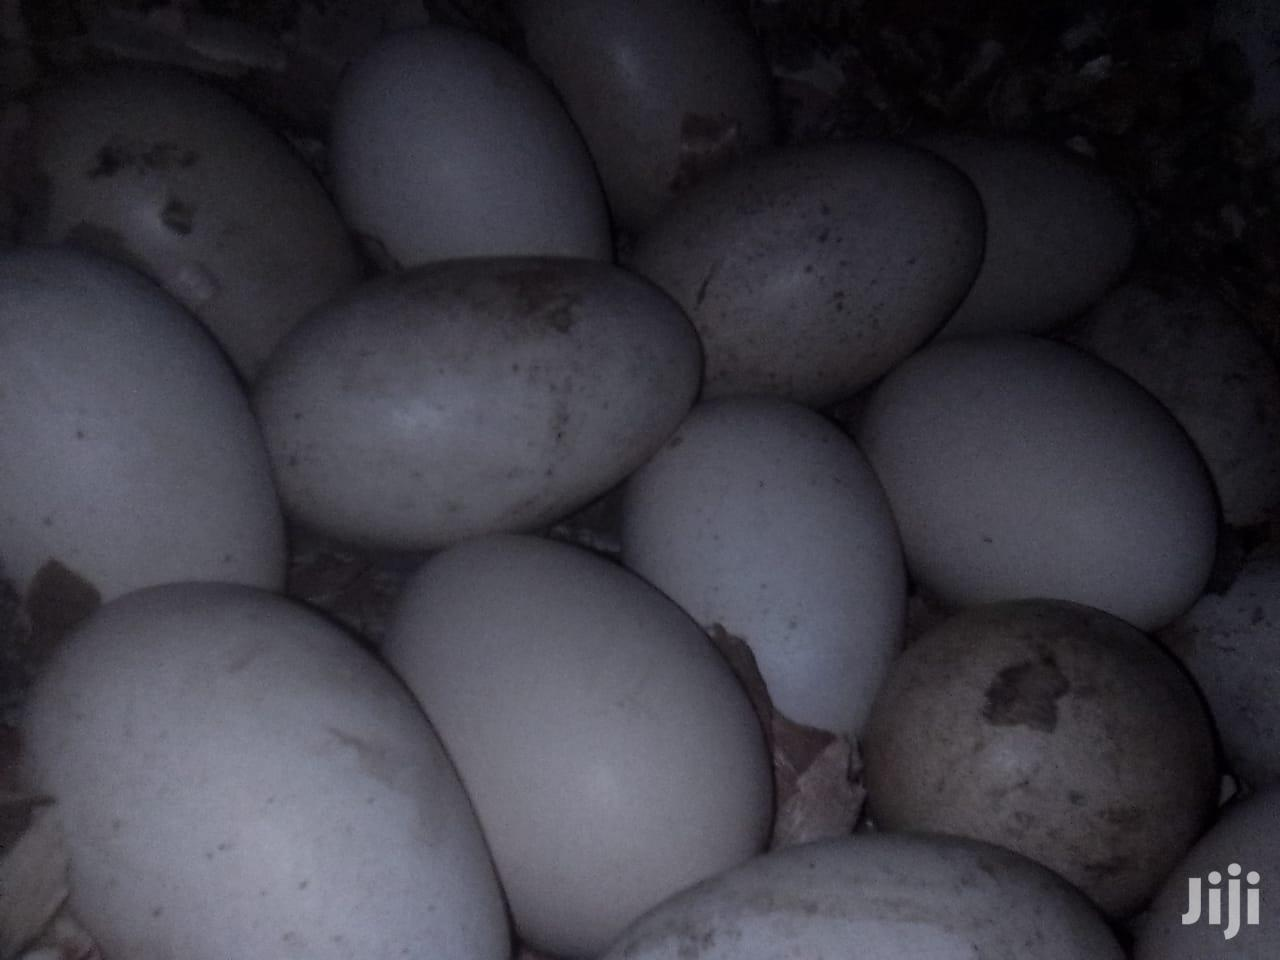 Pure Brahma Chicken Eggs | Meals & Drinks for sale in Tudor, Mombasa, Kenya